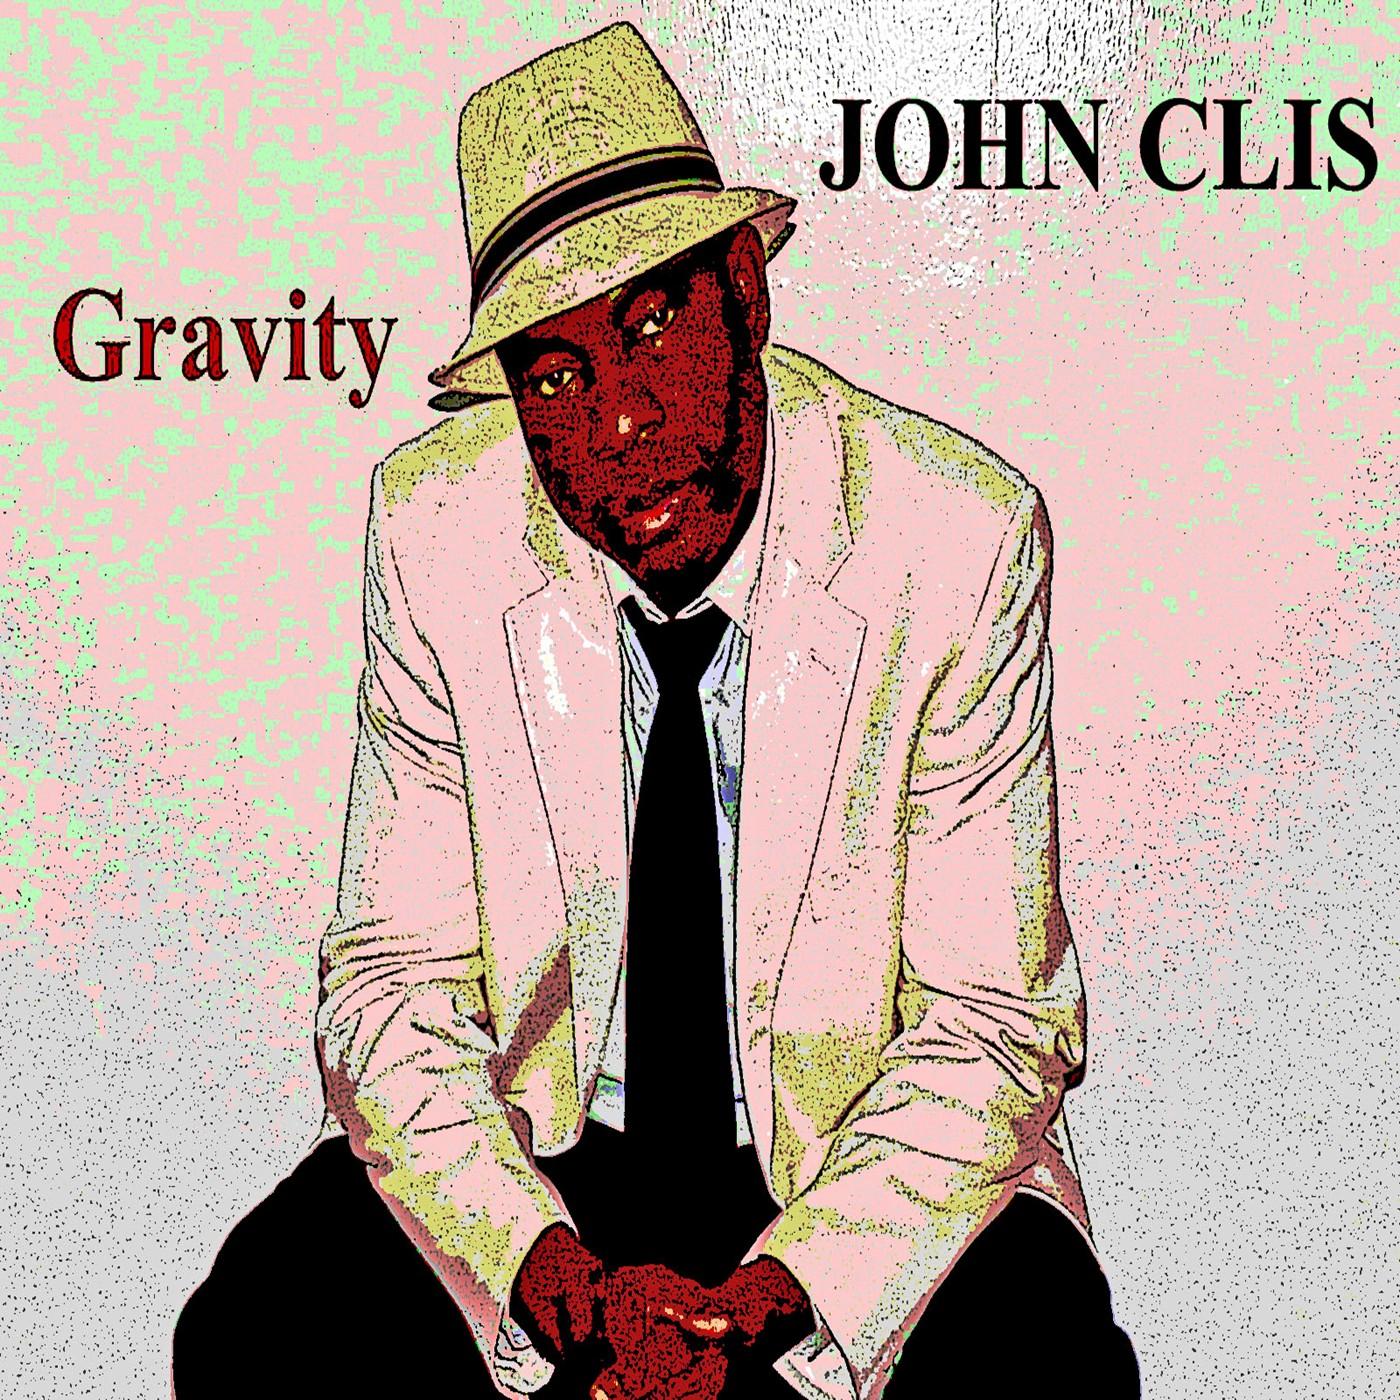 https://0201.nccdn.net/4_2/000/000/046/6ea/JOHN-CLIS-2ND-CD.jpg